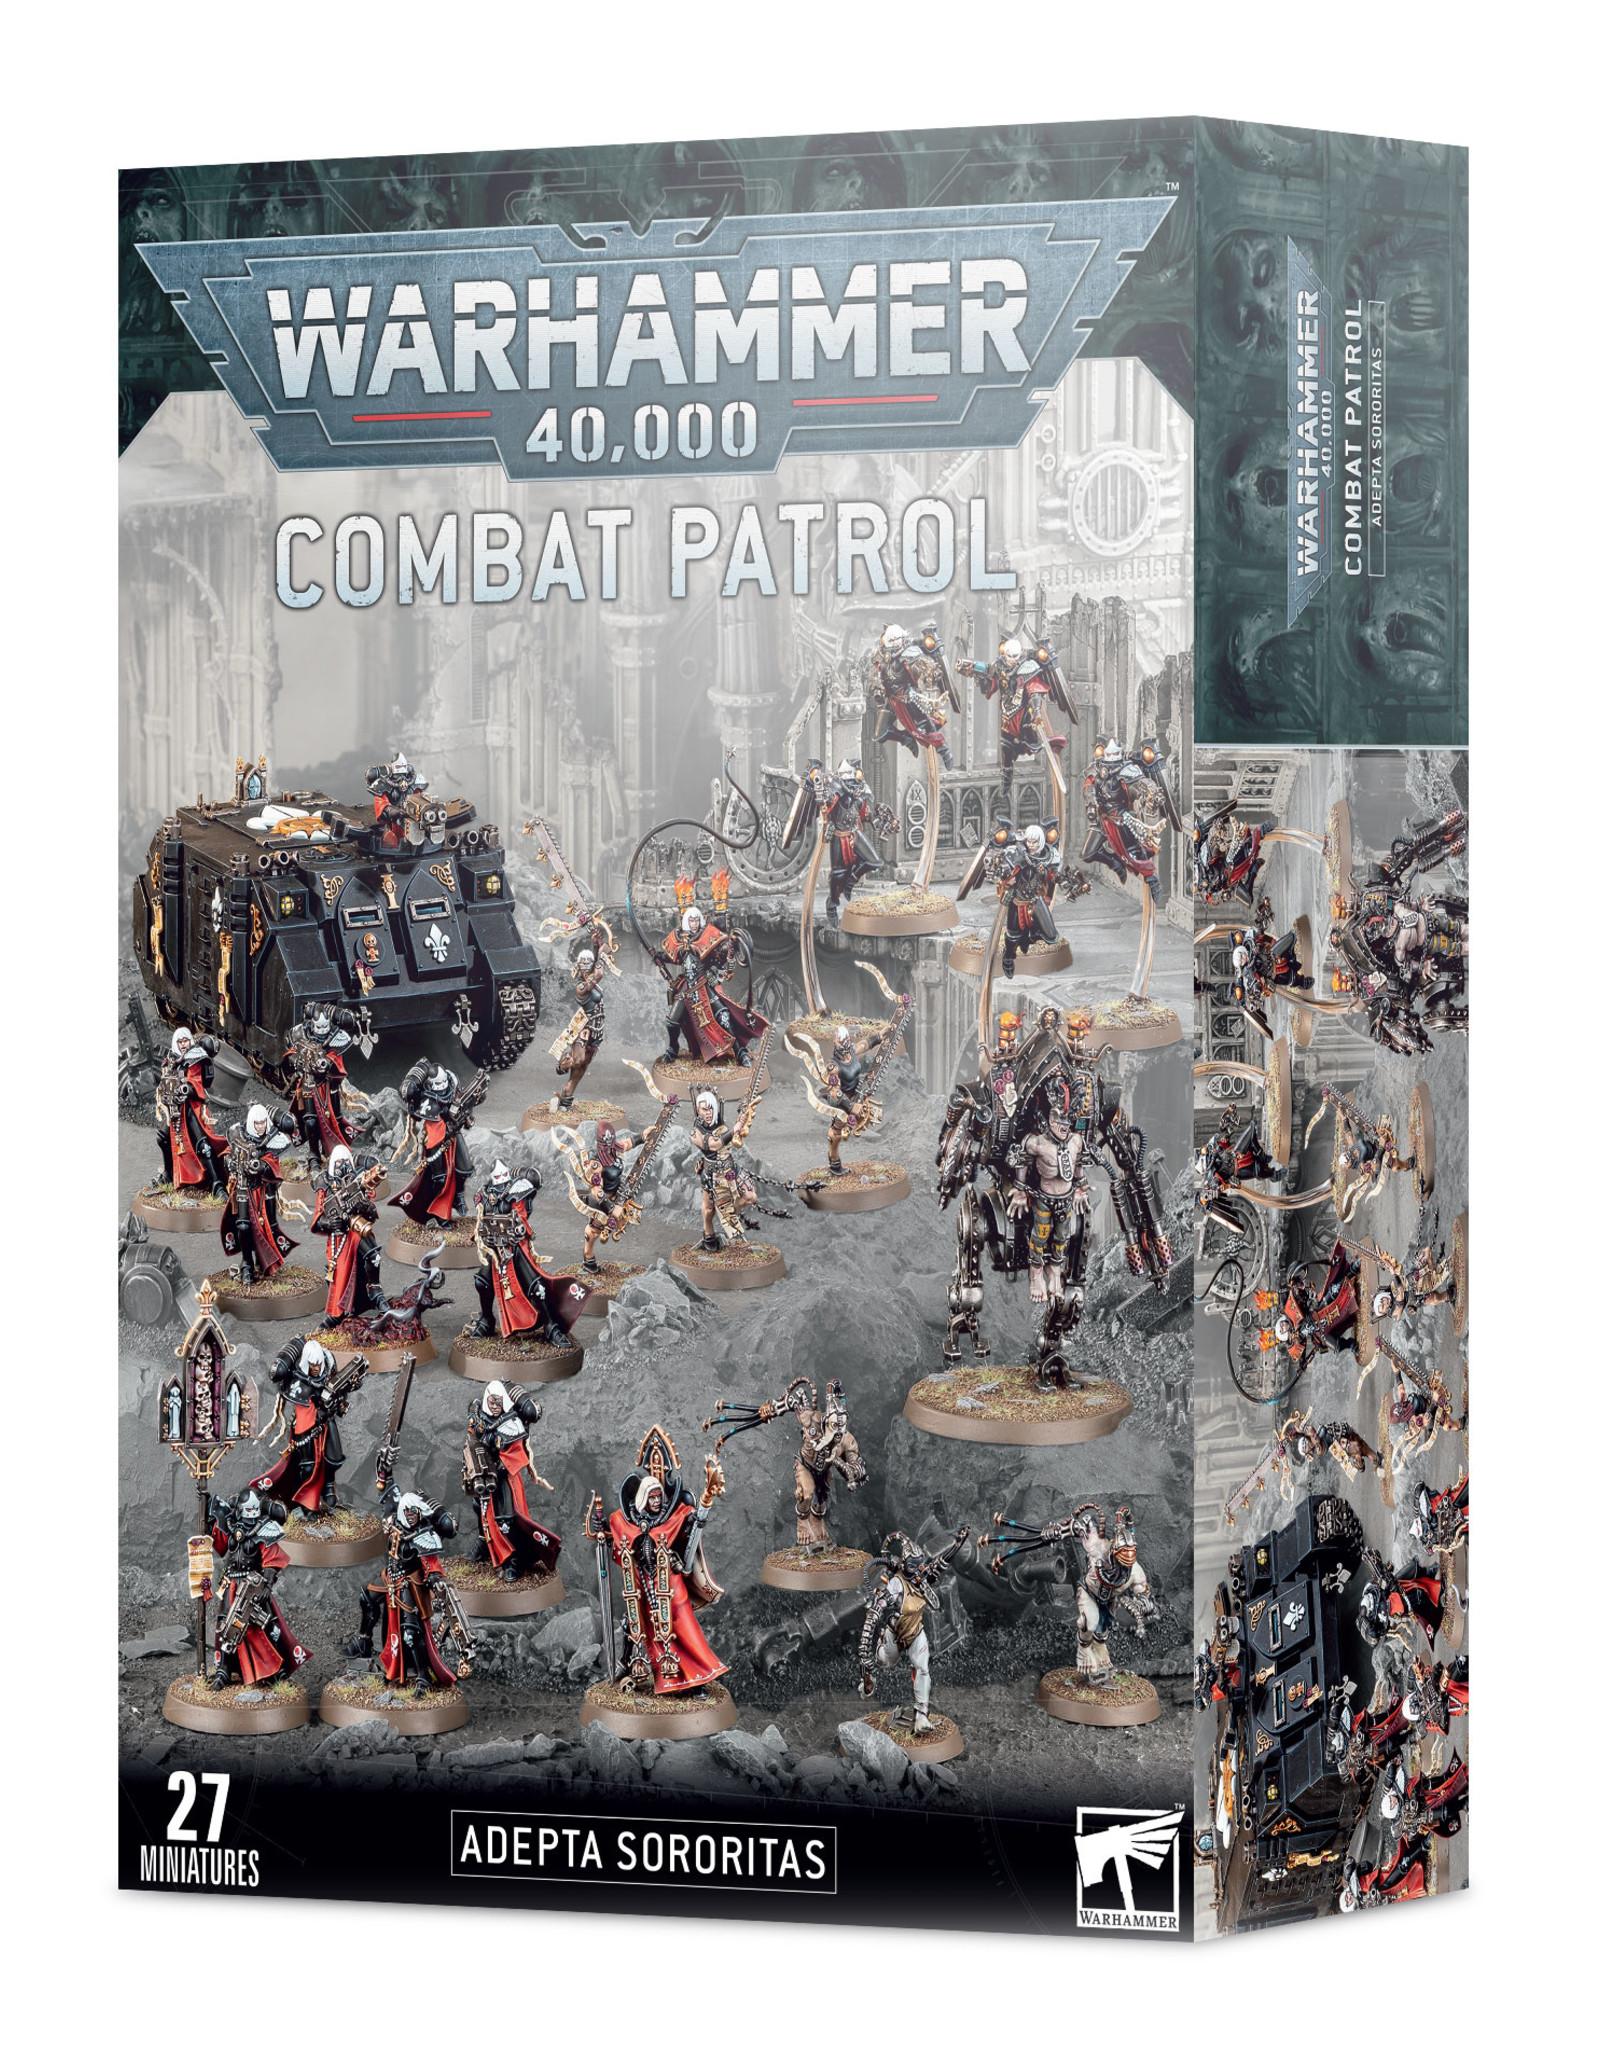 Games Workshop Combat Patrol: Adepta Sororitas